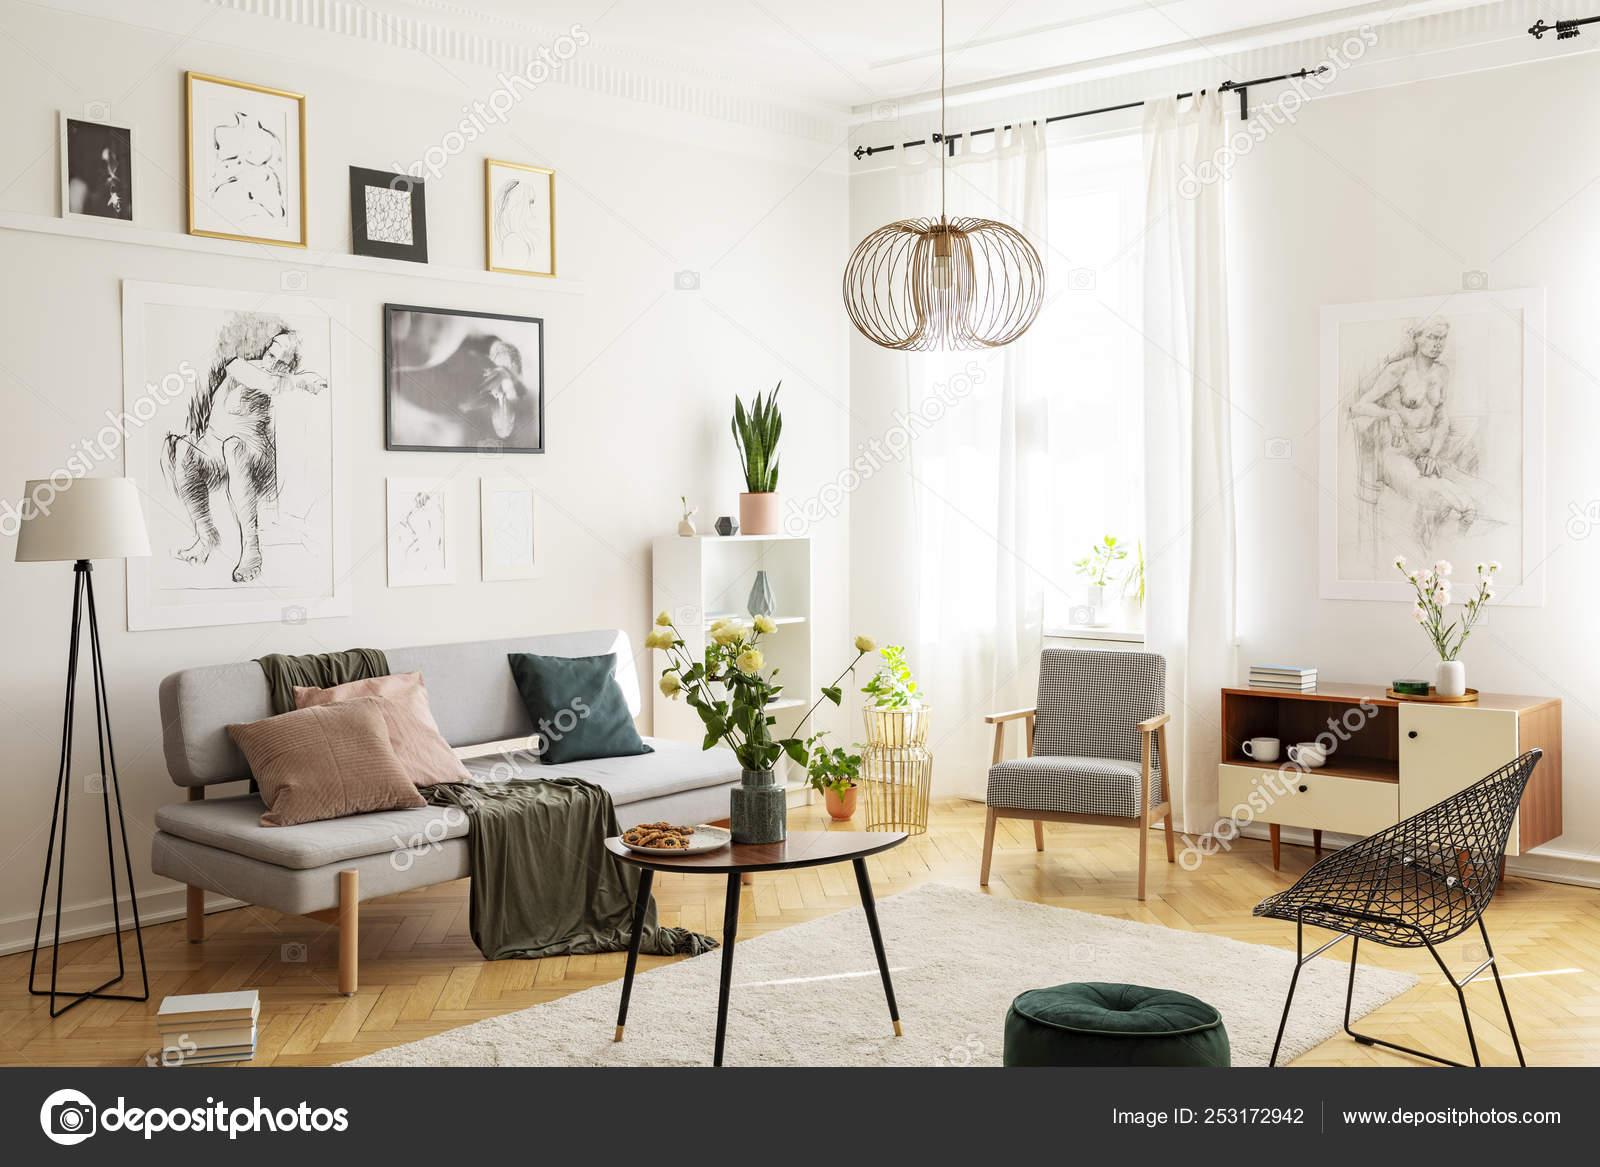 Warm Carpet On Parquet Floor Of Trendy, Trendy Living Room